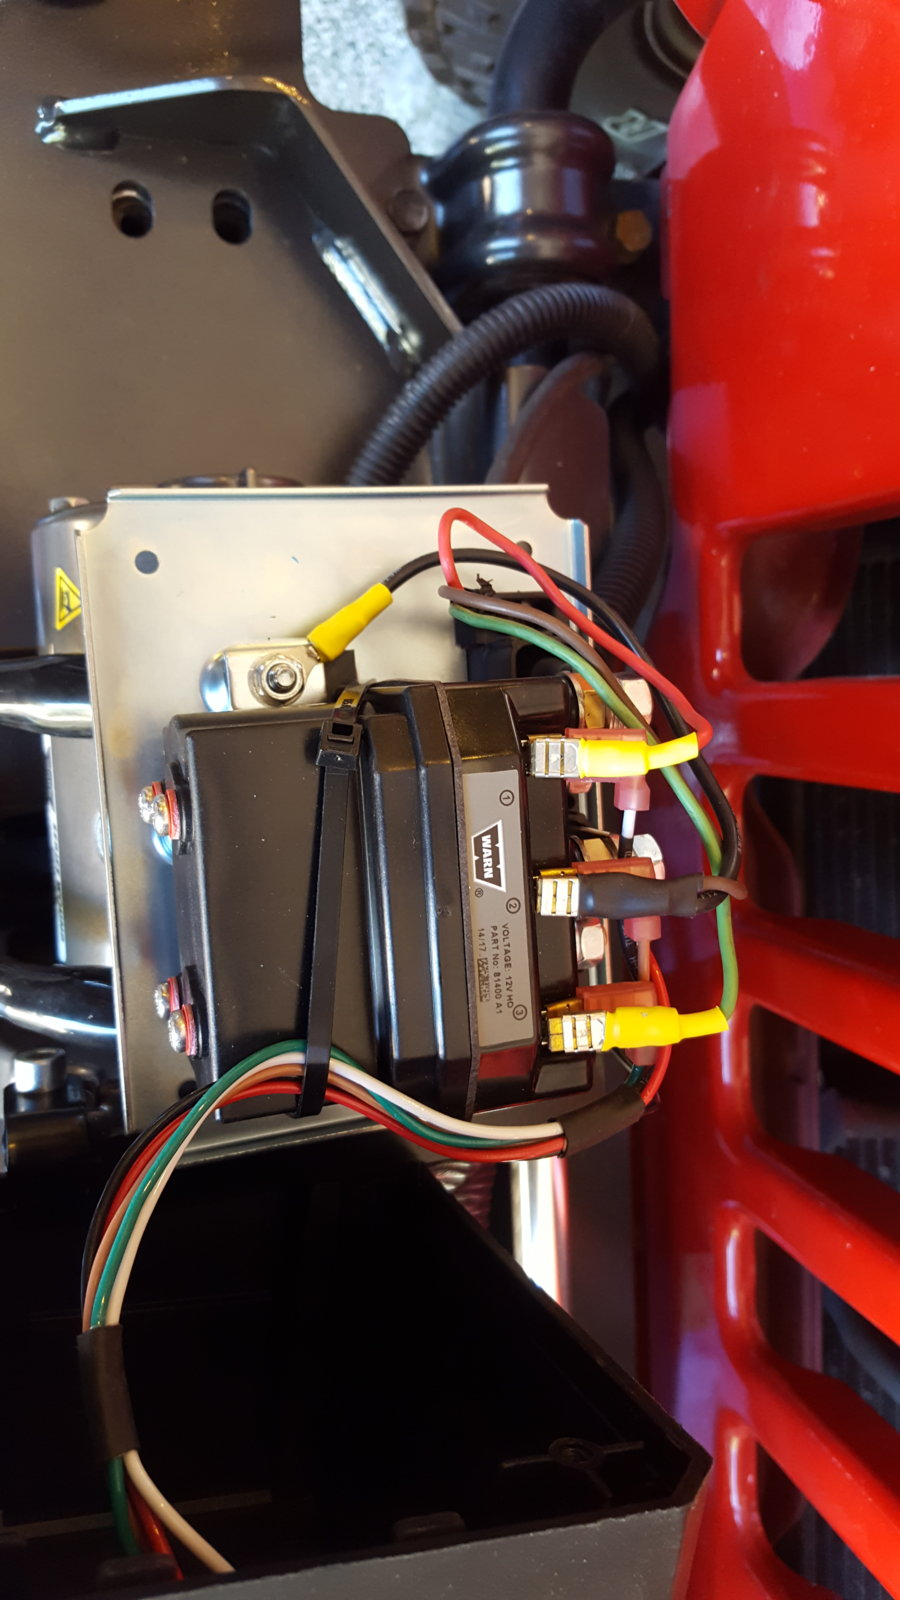 Warn Winch Controller Wiring Diagram Warn Winch Remote Wiring Warn